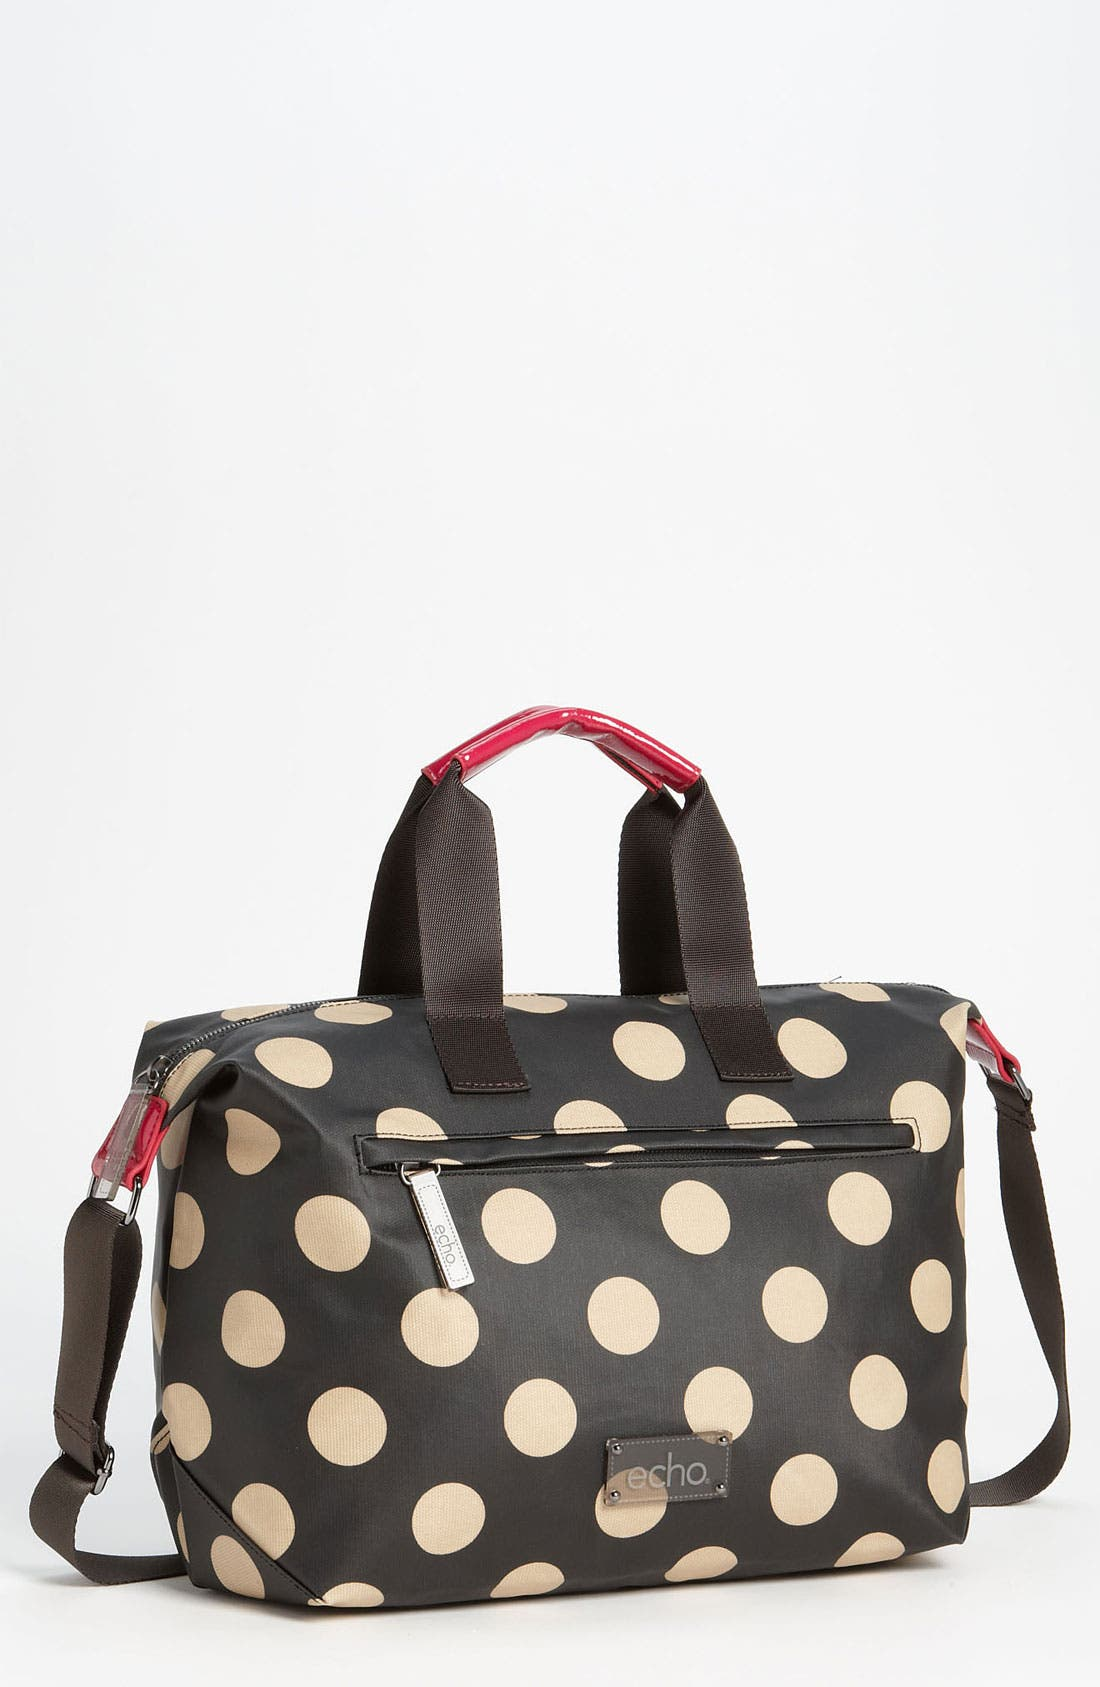 Alternate Image 1 Selected - Echo 'Vintage - Medium' Messenger Bag